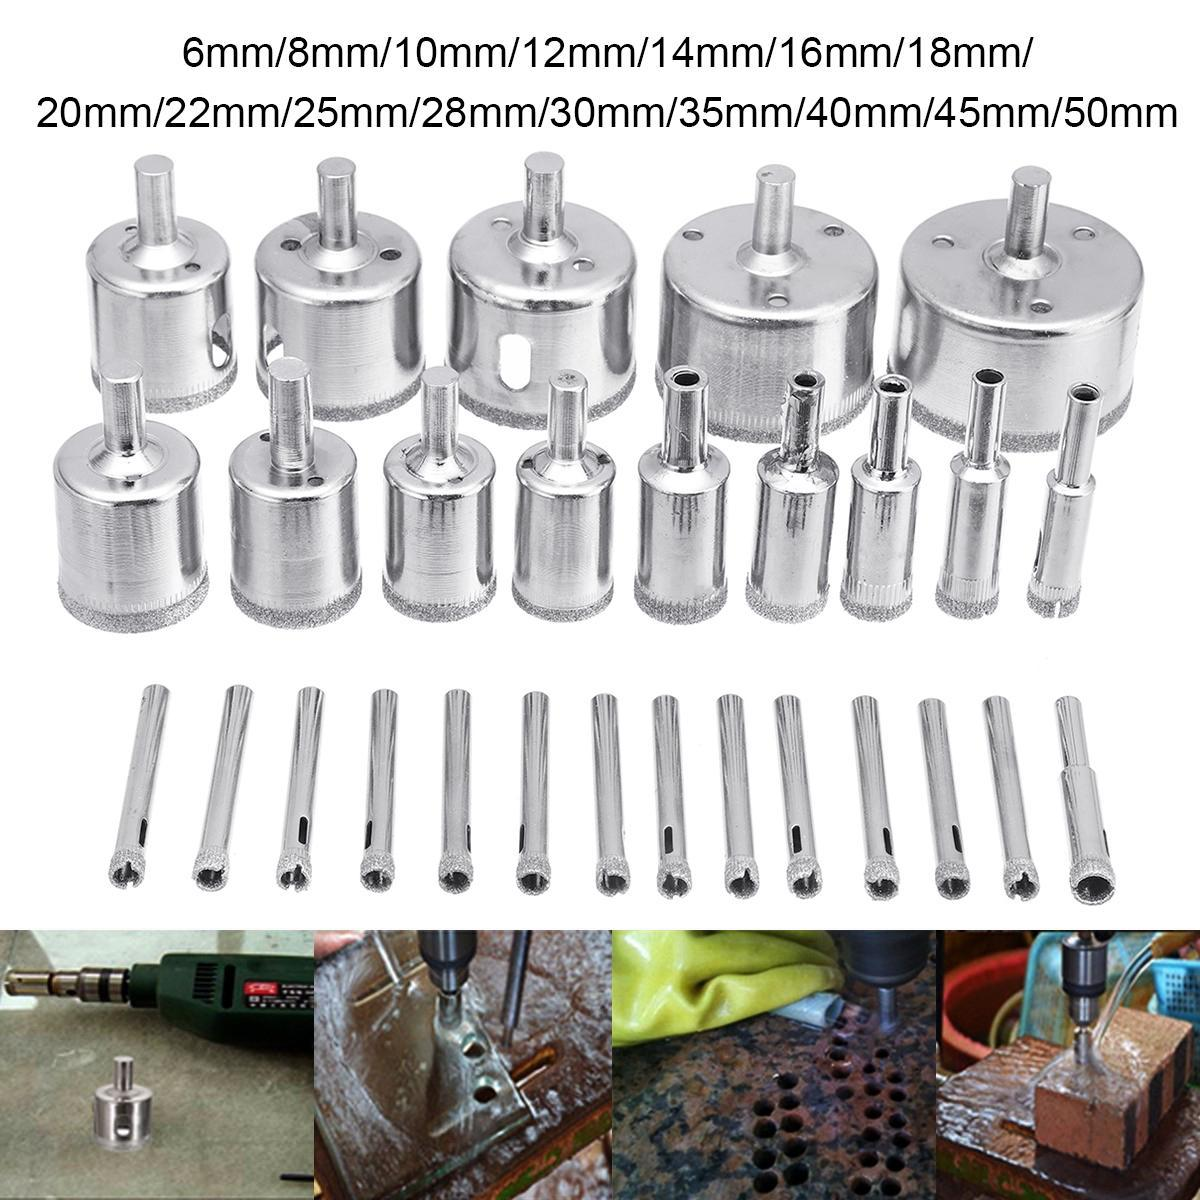 28pcs diamond drill bits kit hole saw cutter for glass marble granite tile 6 50mm